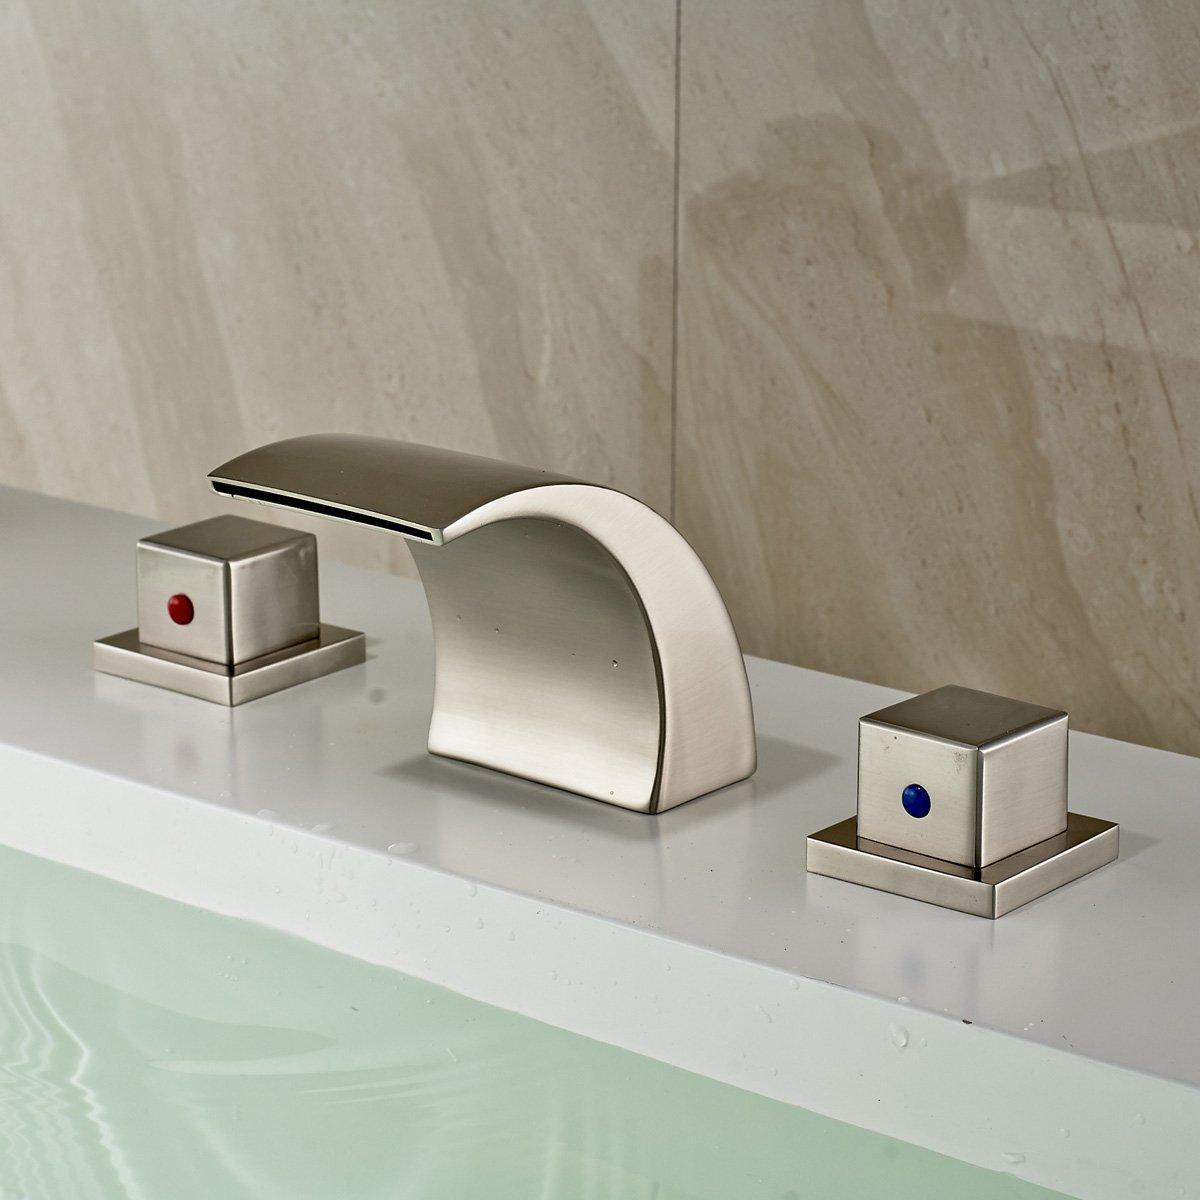 Waterfall Bathroom Faucet | Rozin Widespread 3 Holes Waterfall Bathroom Basin Faucet Double